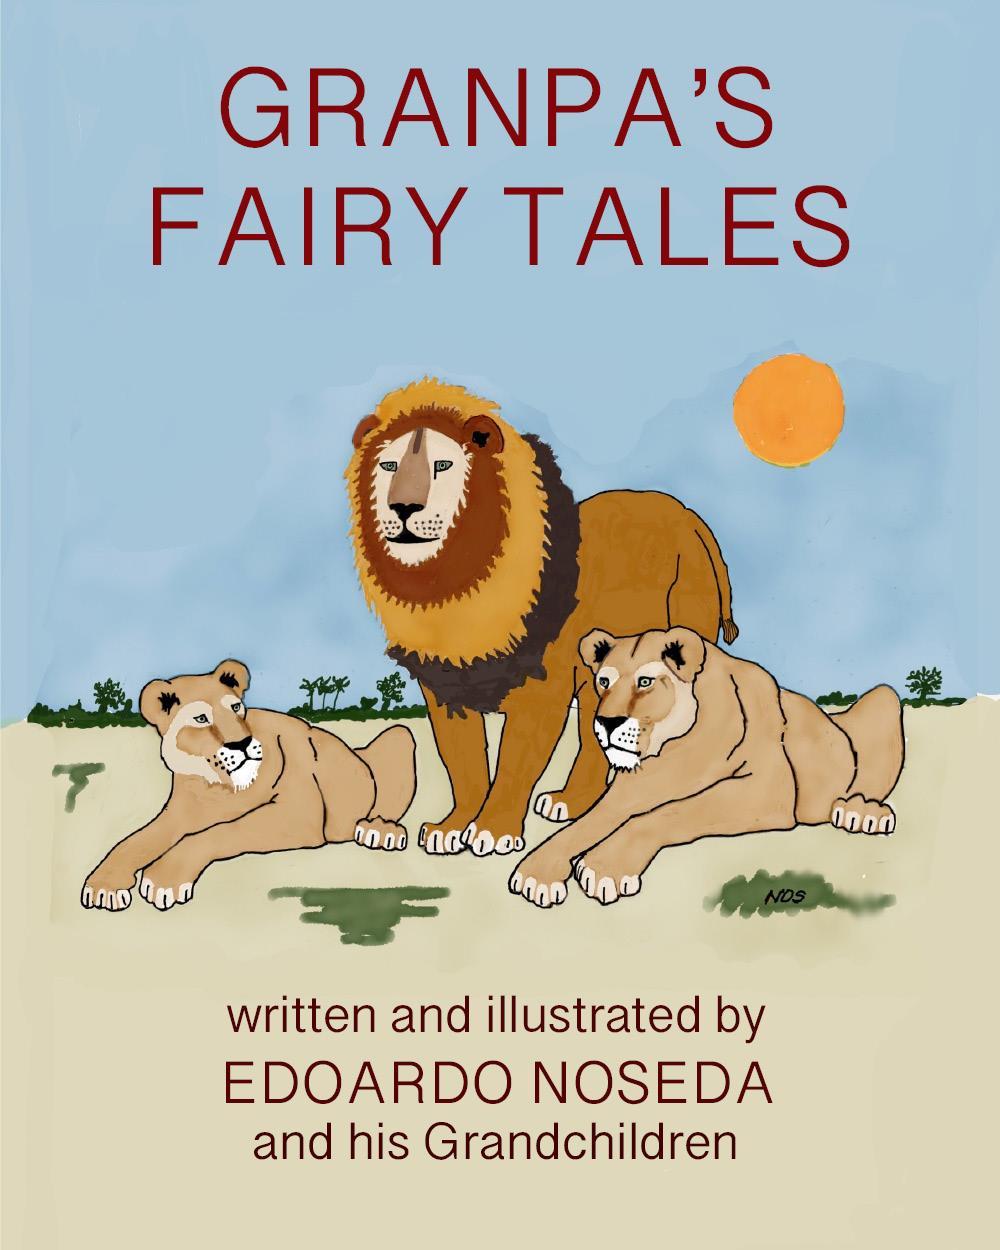 Grandpa's Fairy Tales